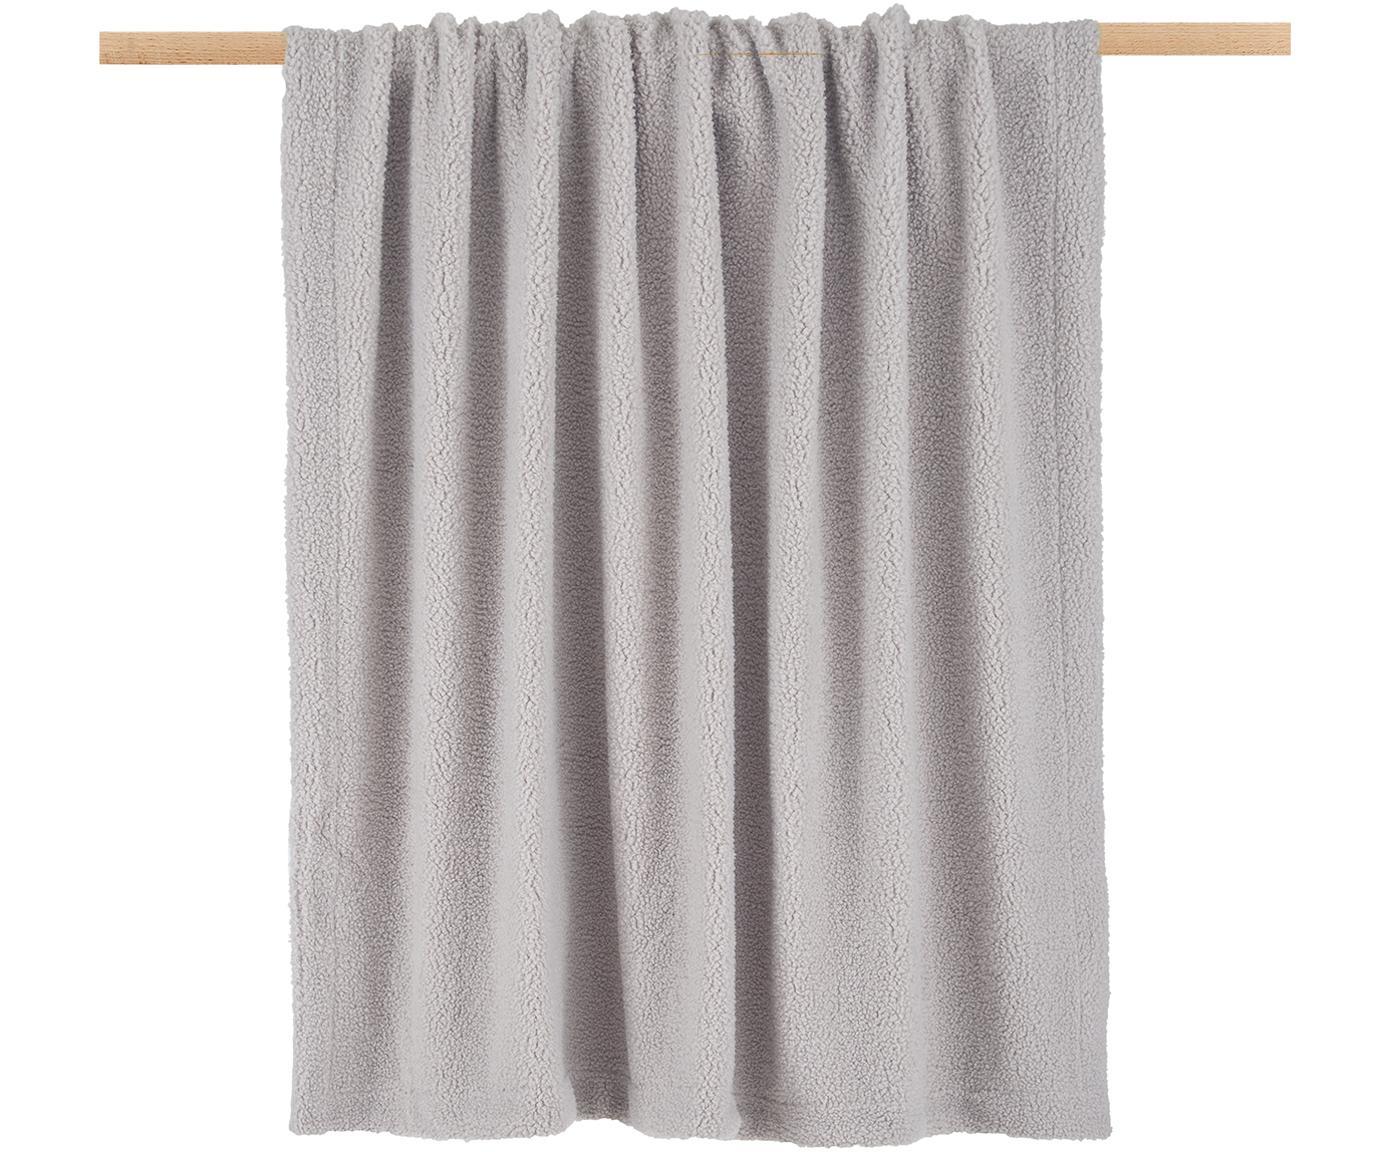 Teddy plaid Mille, Bovenzijde: 100% polyester (teddyvach, Onderzijde: 100% polyester, Lichtgrijs, 150 x 200 cm